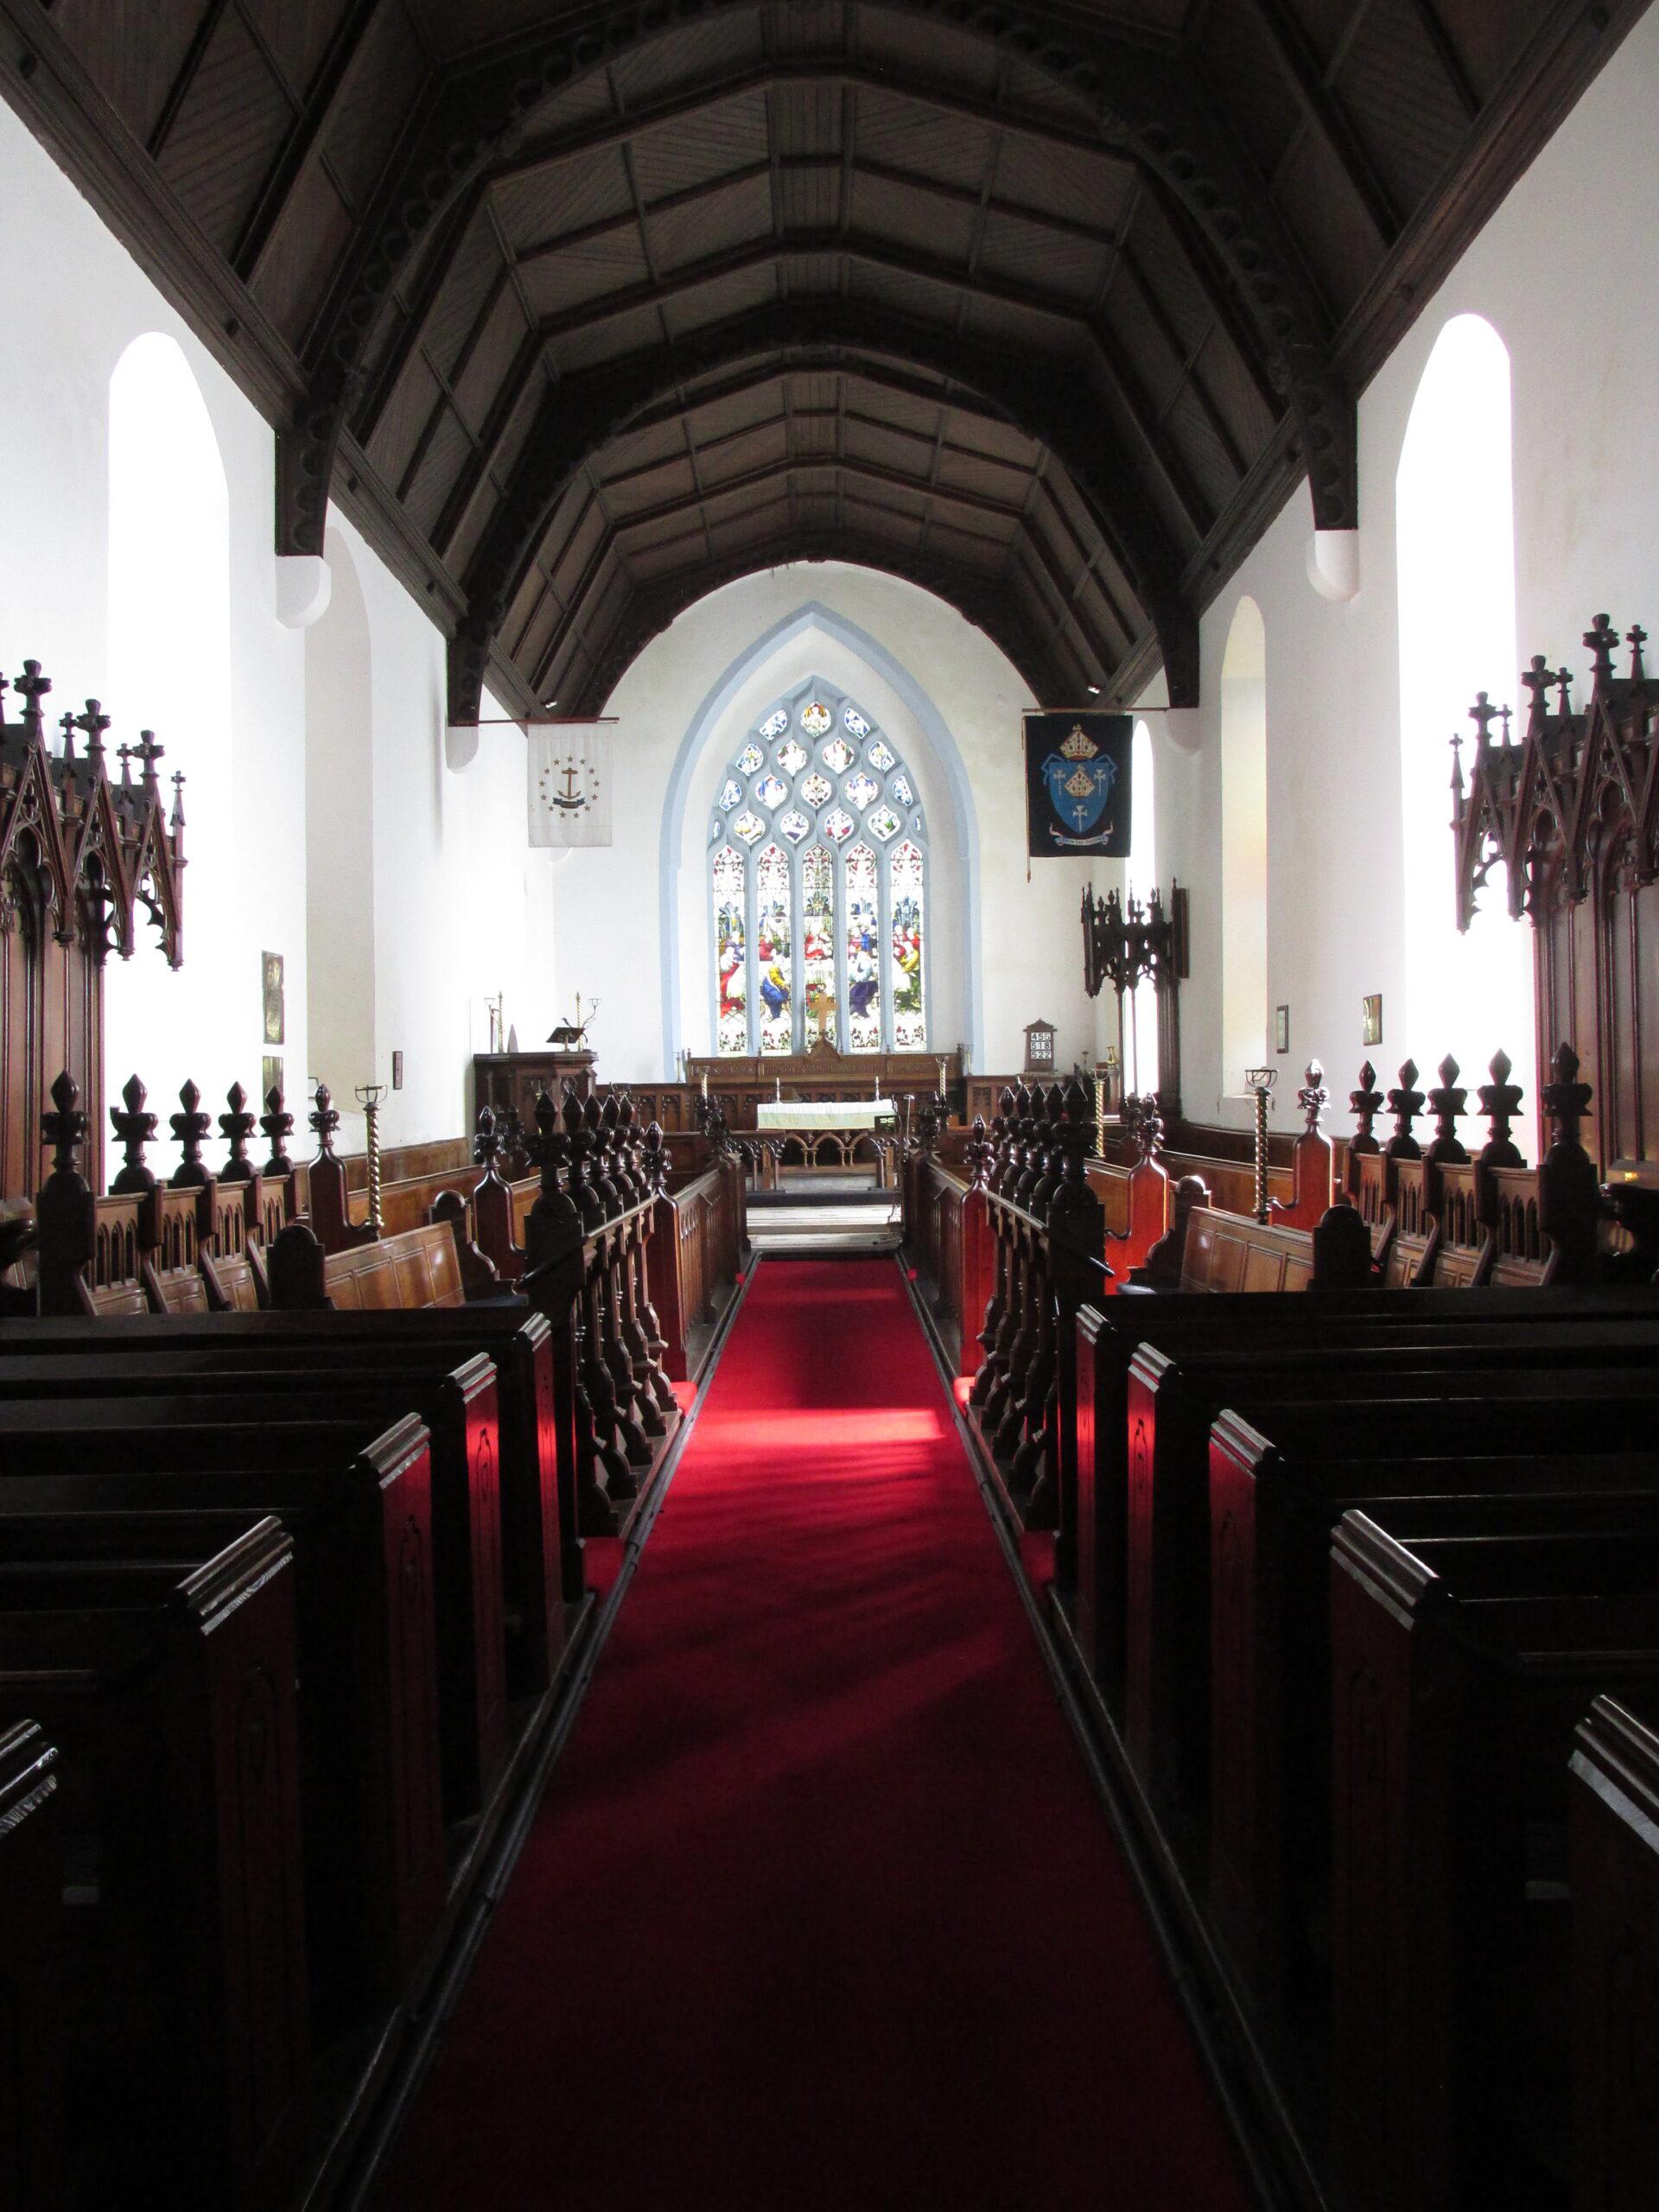 Choir of St. Colman's Cathedral, Cloyne